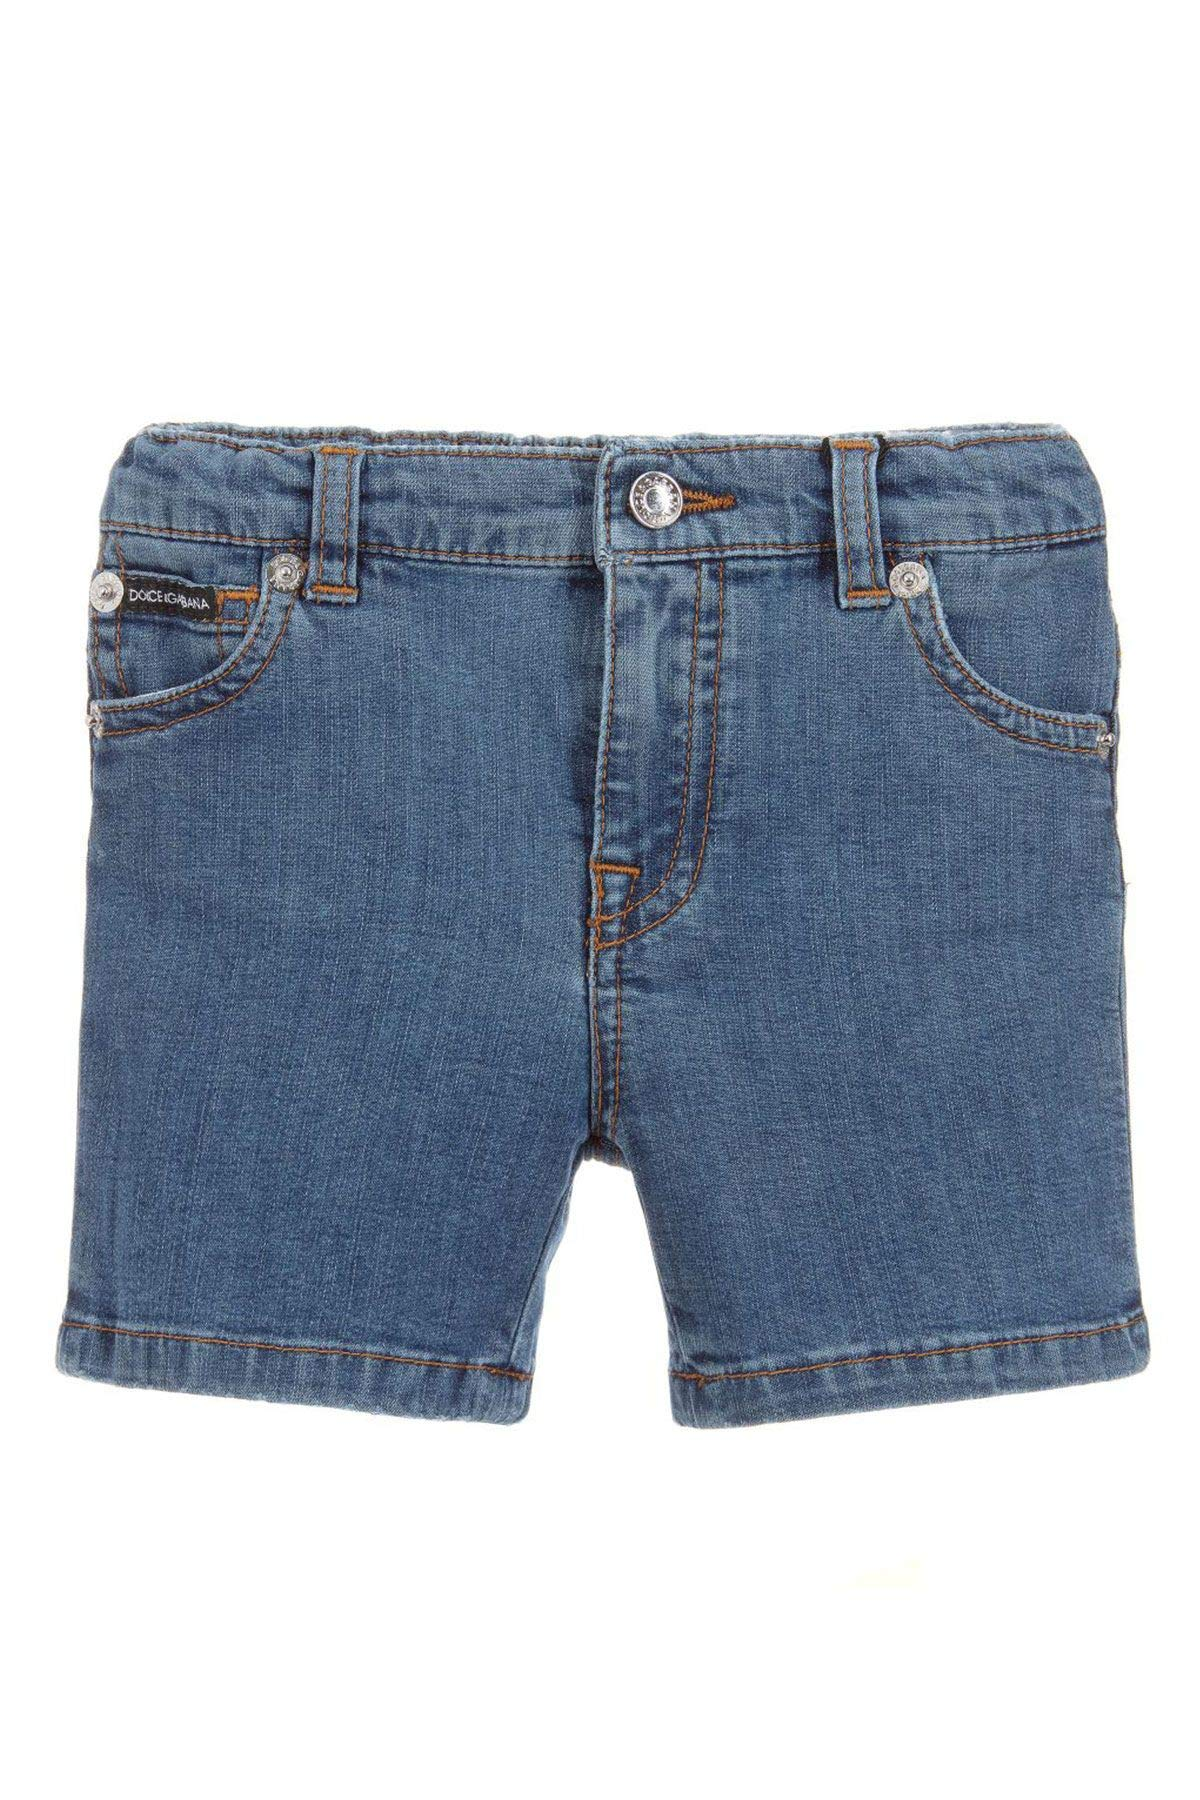 Dolce e Gabbana Baby Boys L12q38ld824b1823 Blue Cotton Shorts